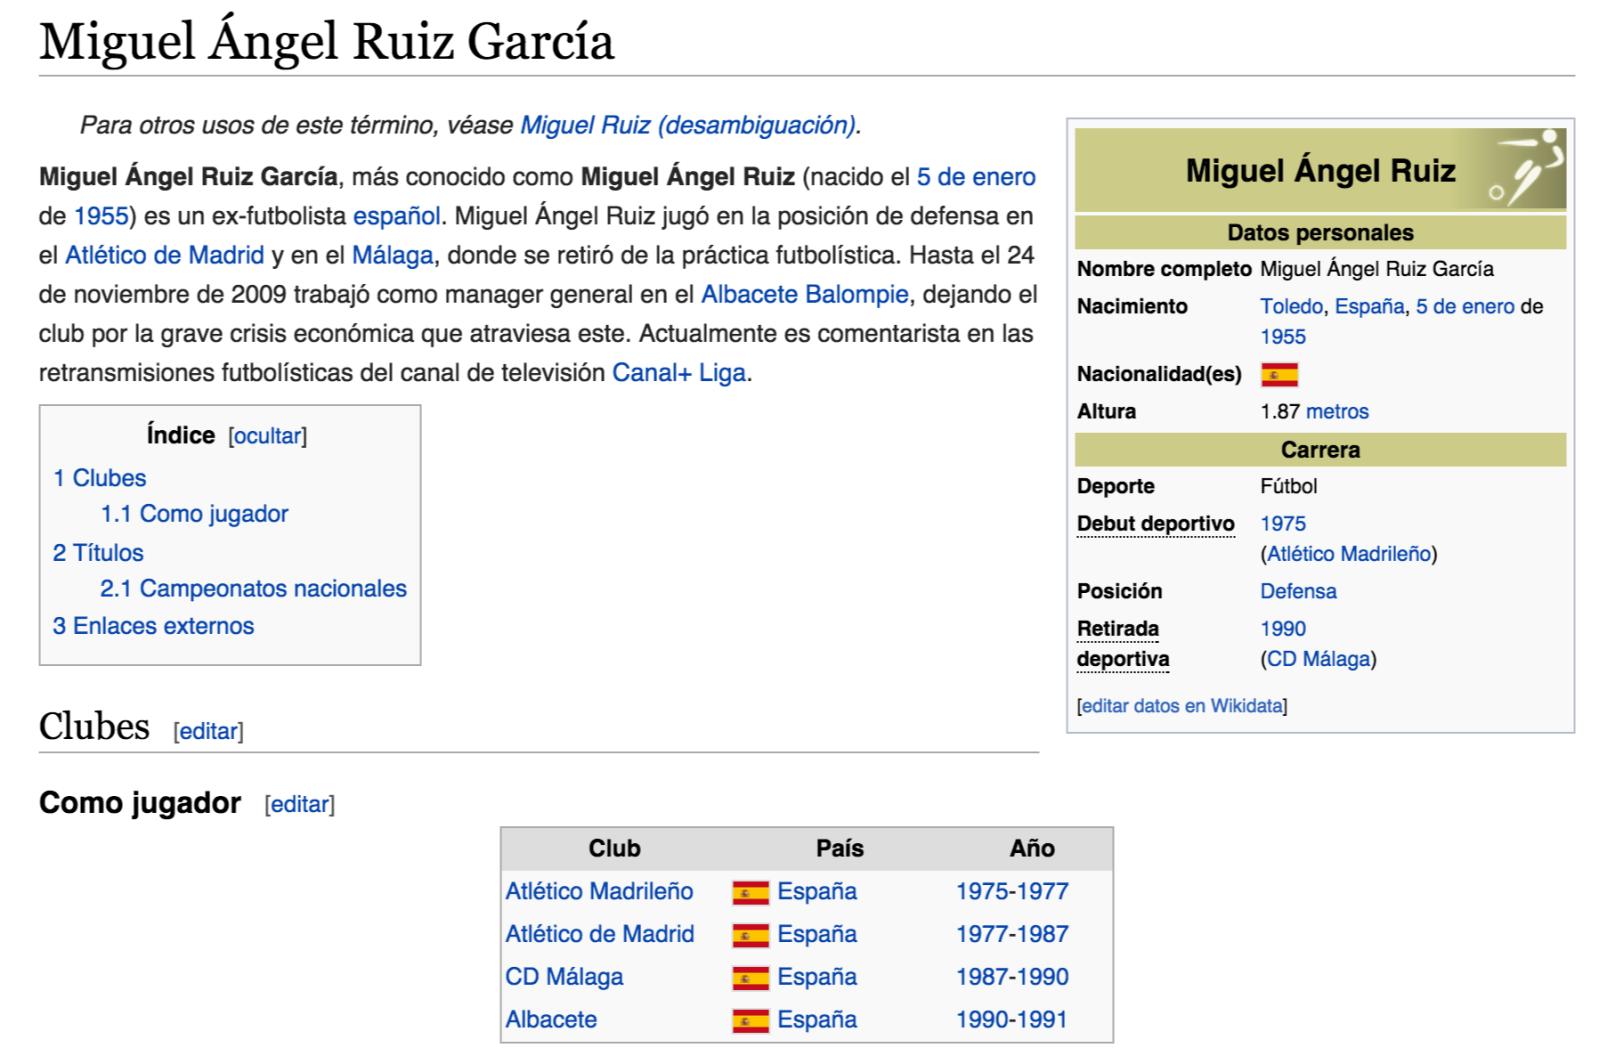 Miguel Ángel Ruiz (1977-1987) Ms14pw